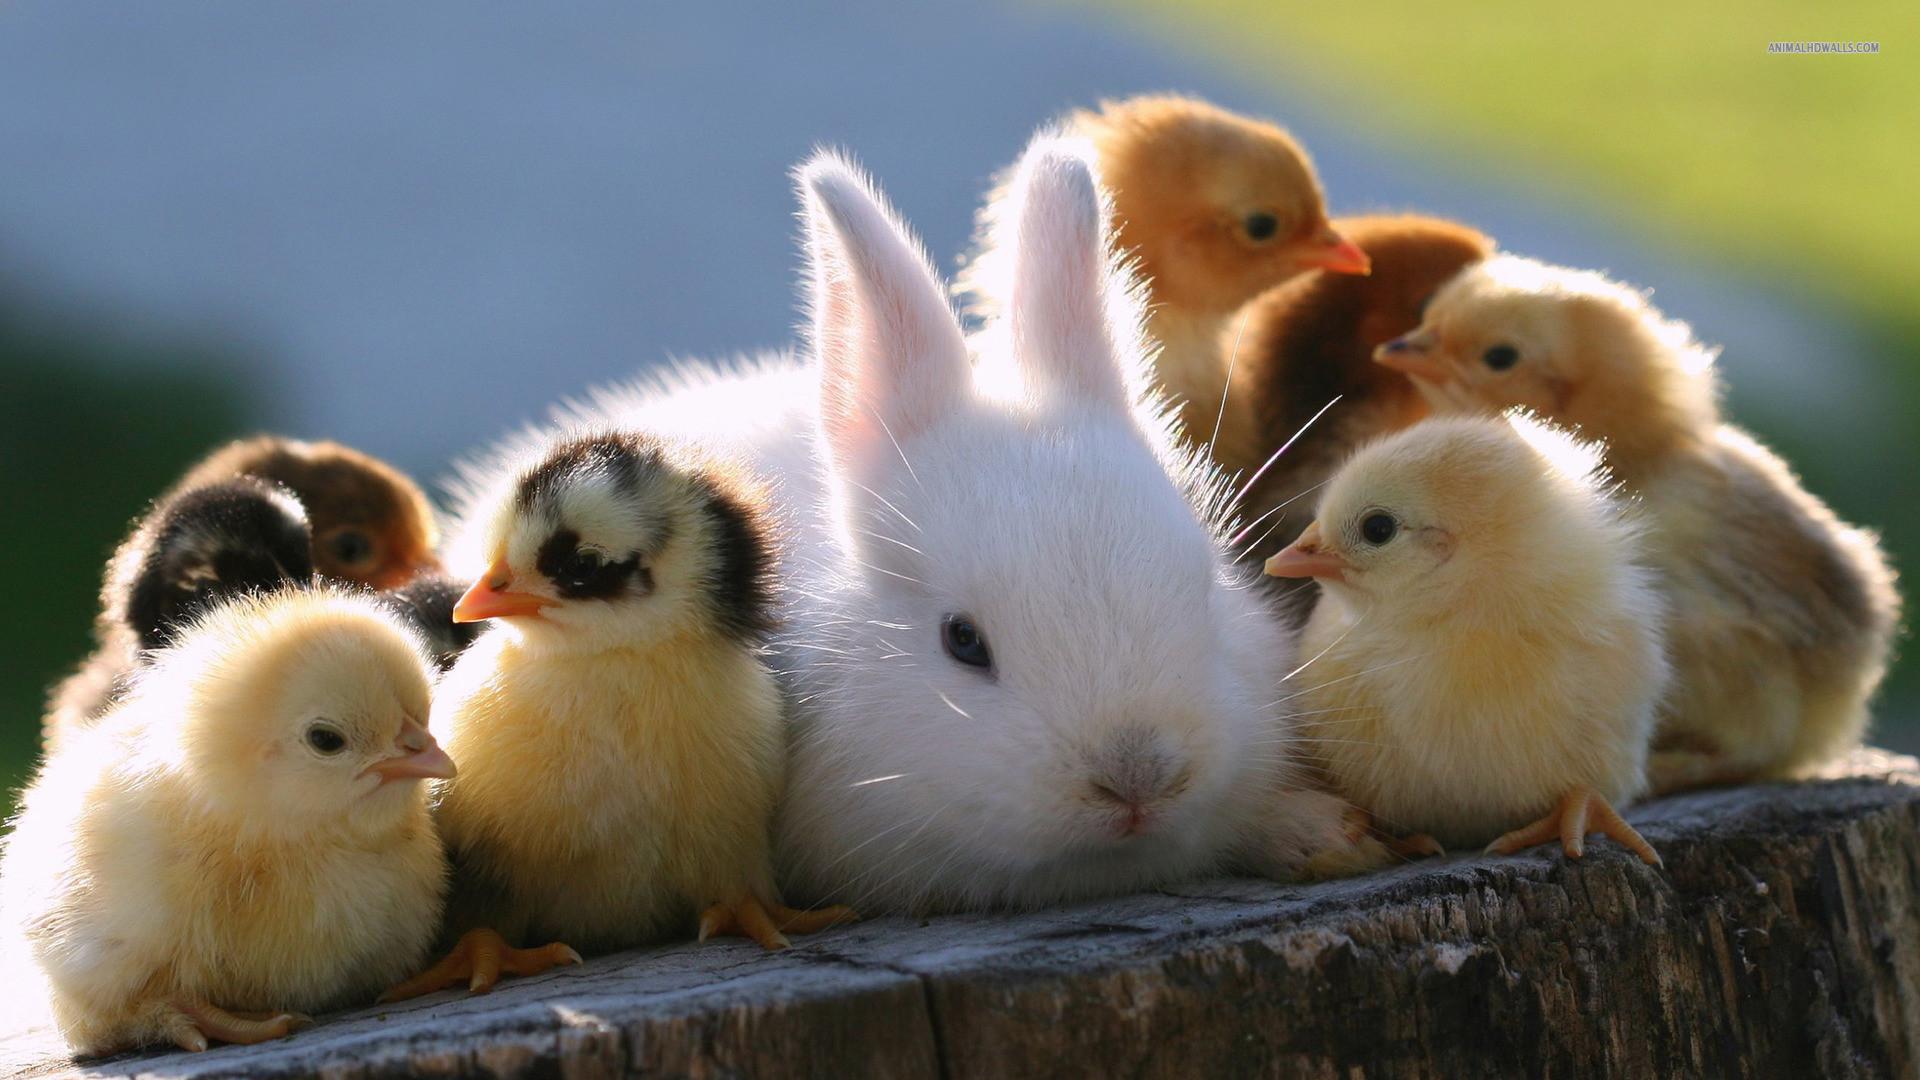 Fun Rabbit Animals Wallpaper Screensaver Wallpaper with .